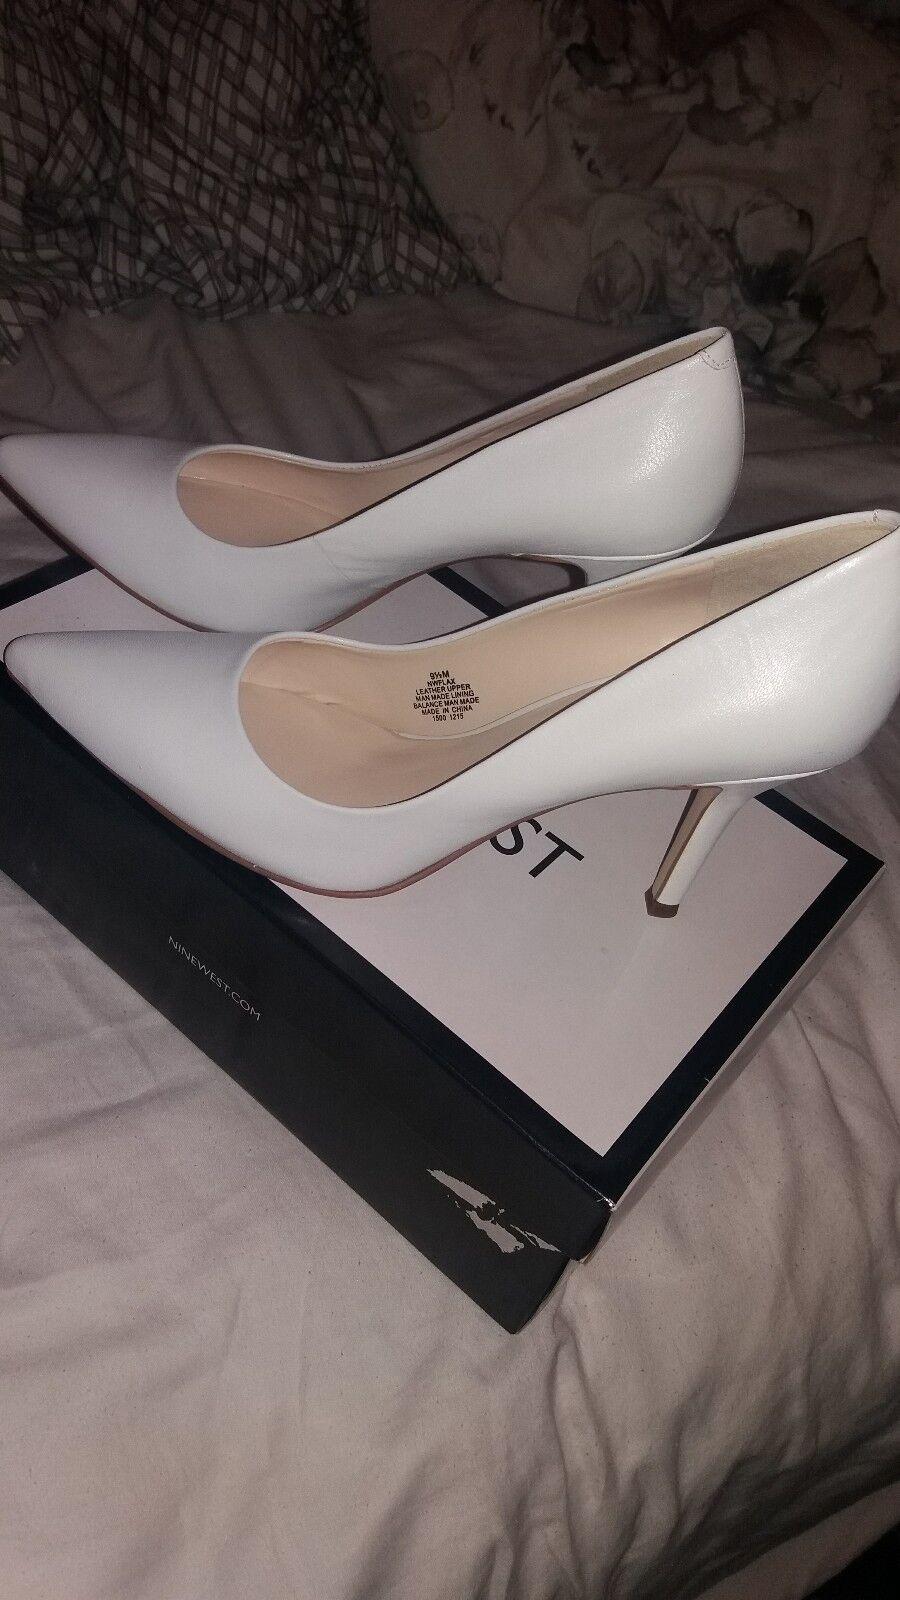 Nine west white heels 9.5